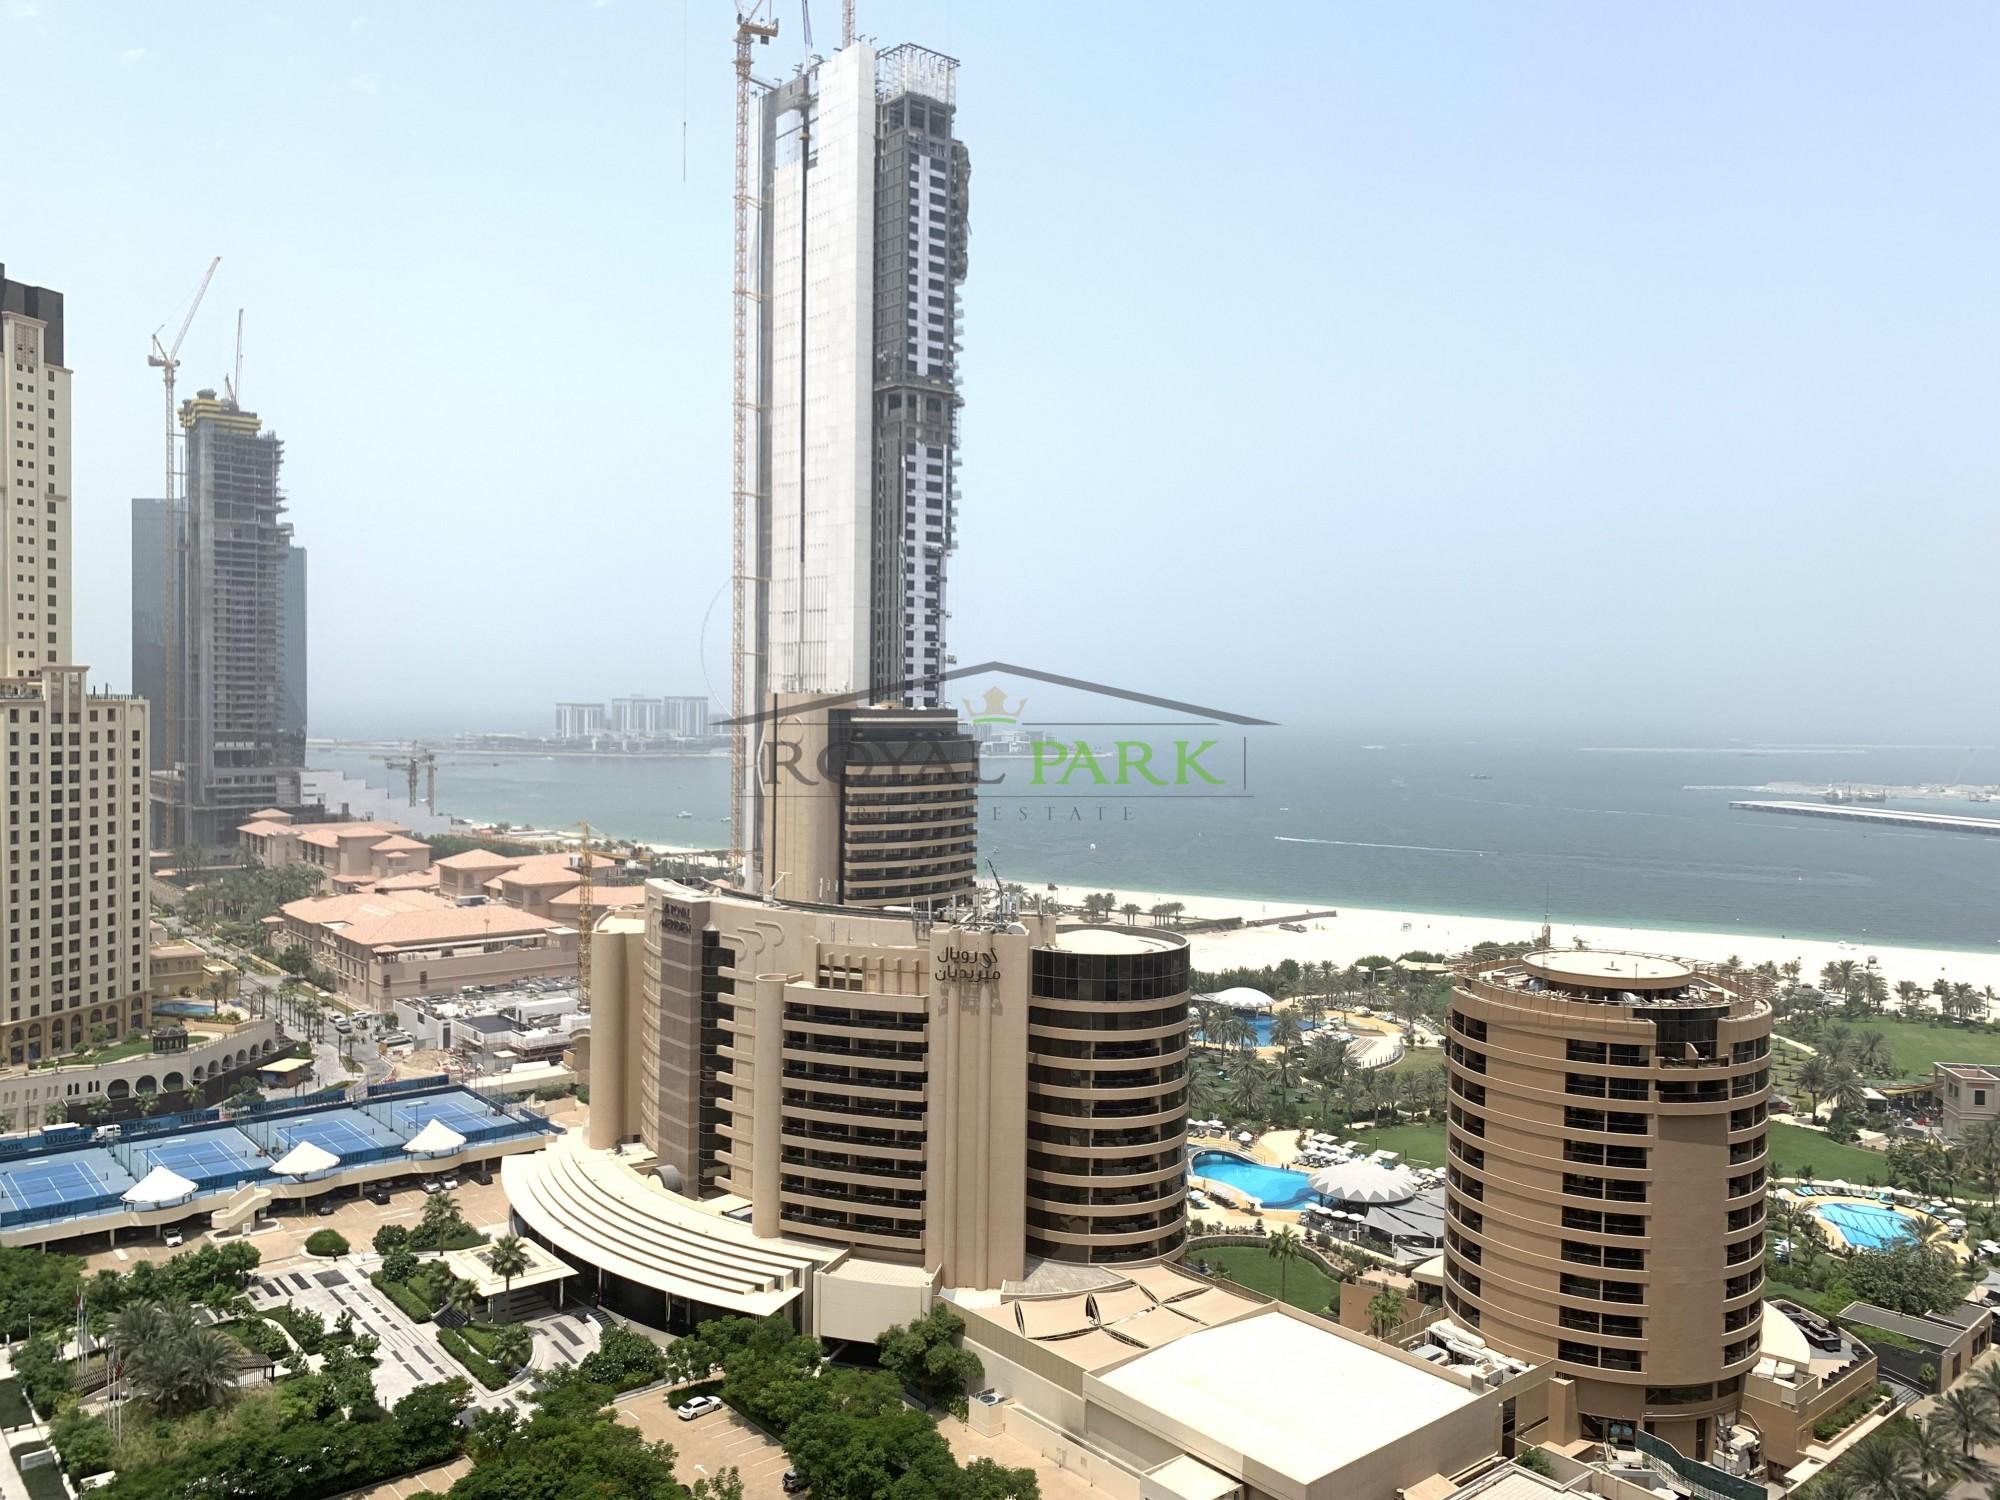 SEA VIEW High Floor 1BR In Botanica Tower Dubai Marina